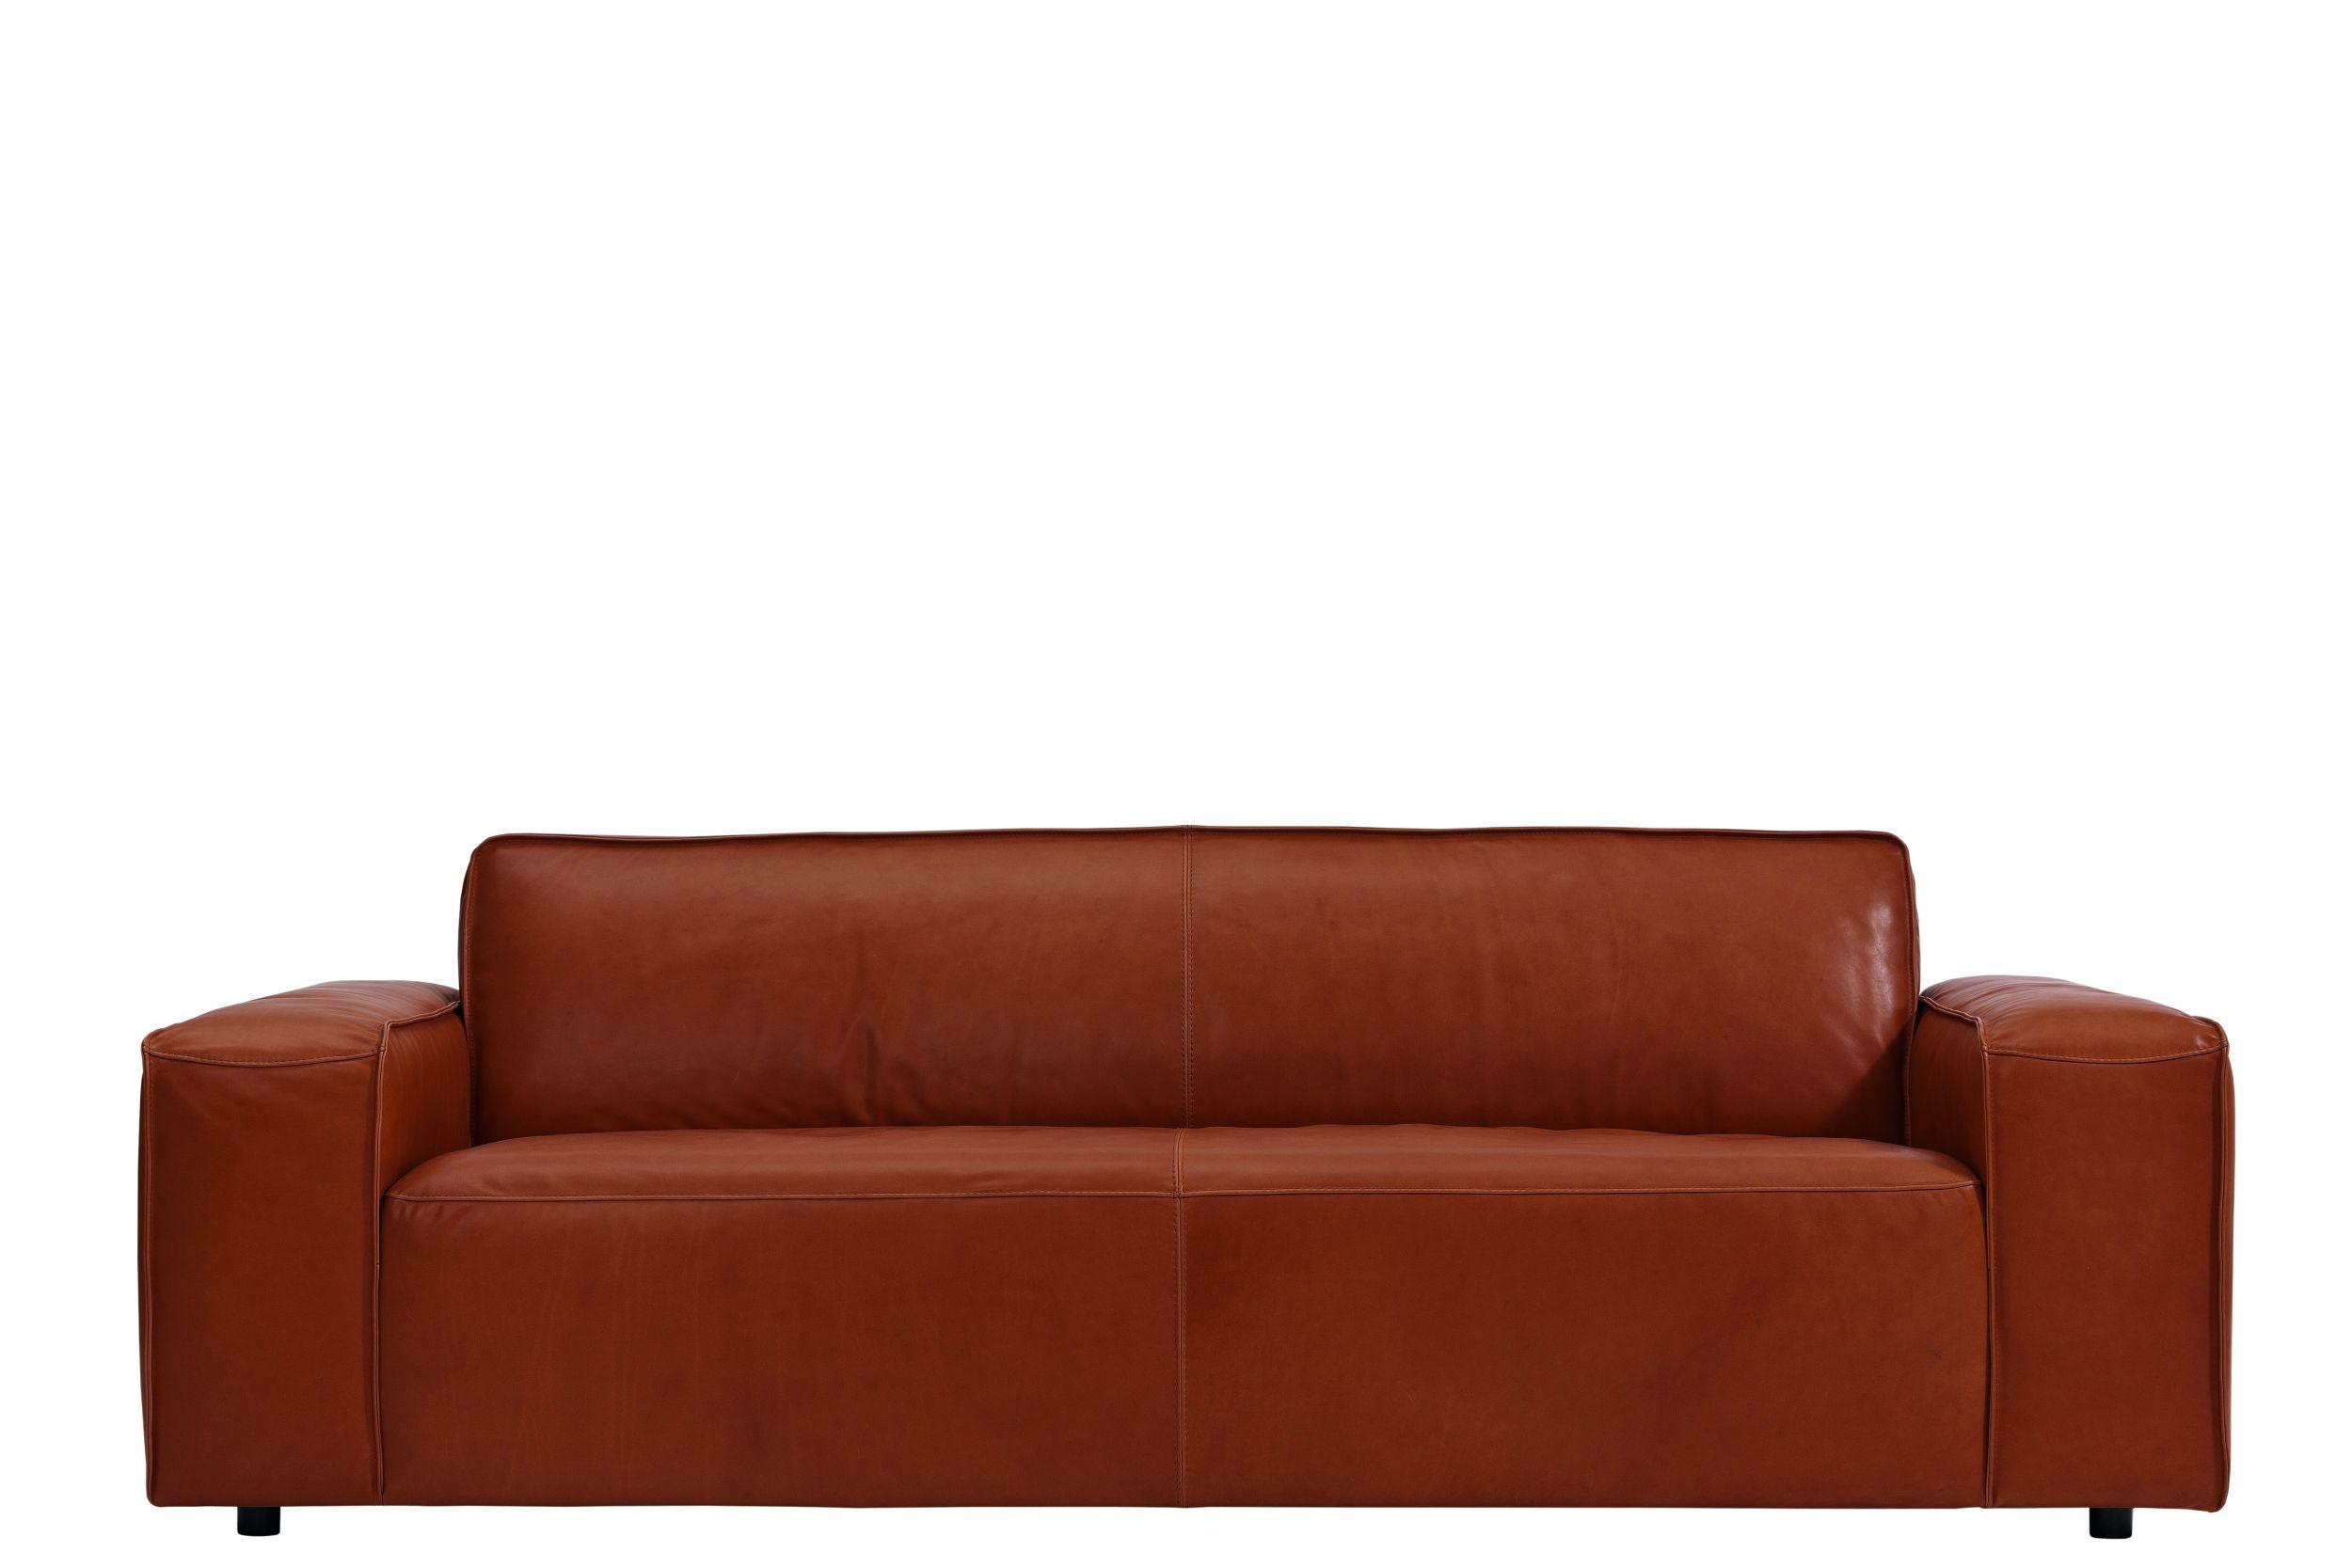 Cognac Farbenes 3 Sitzer Sofa In Leder Natura Denver Mobelhaus